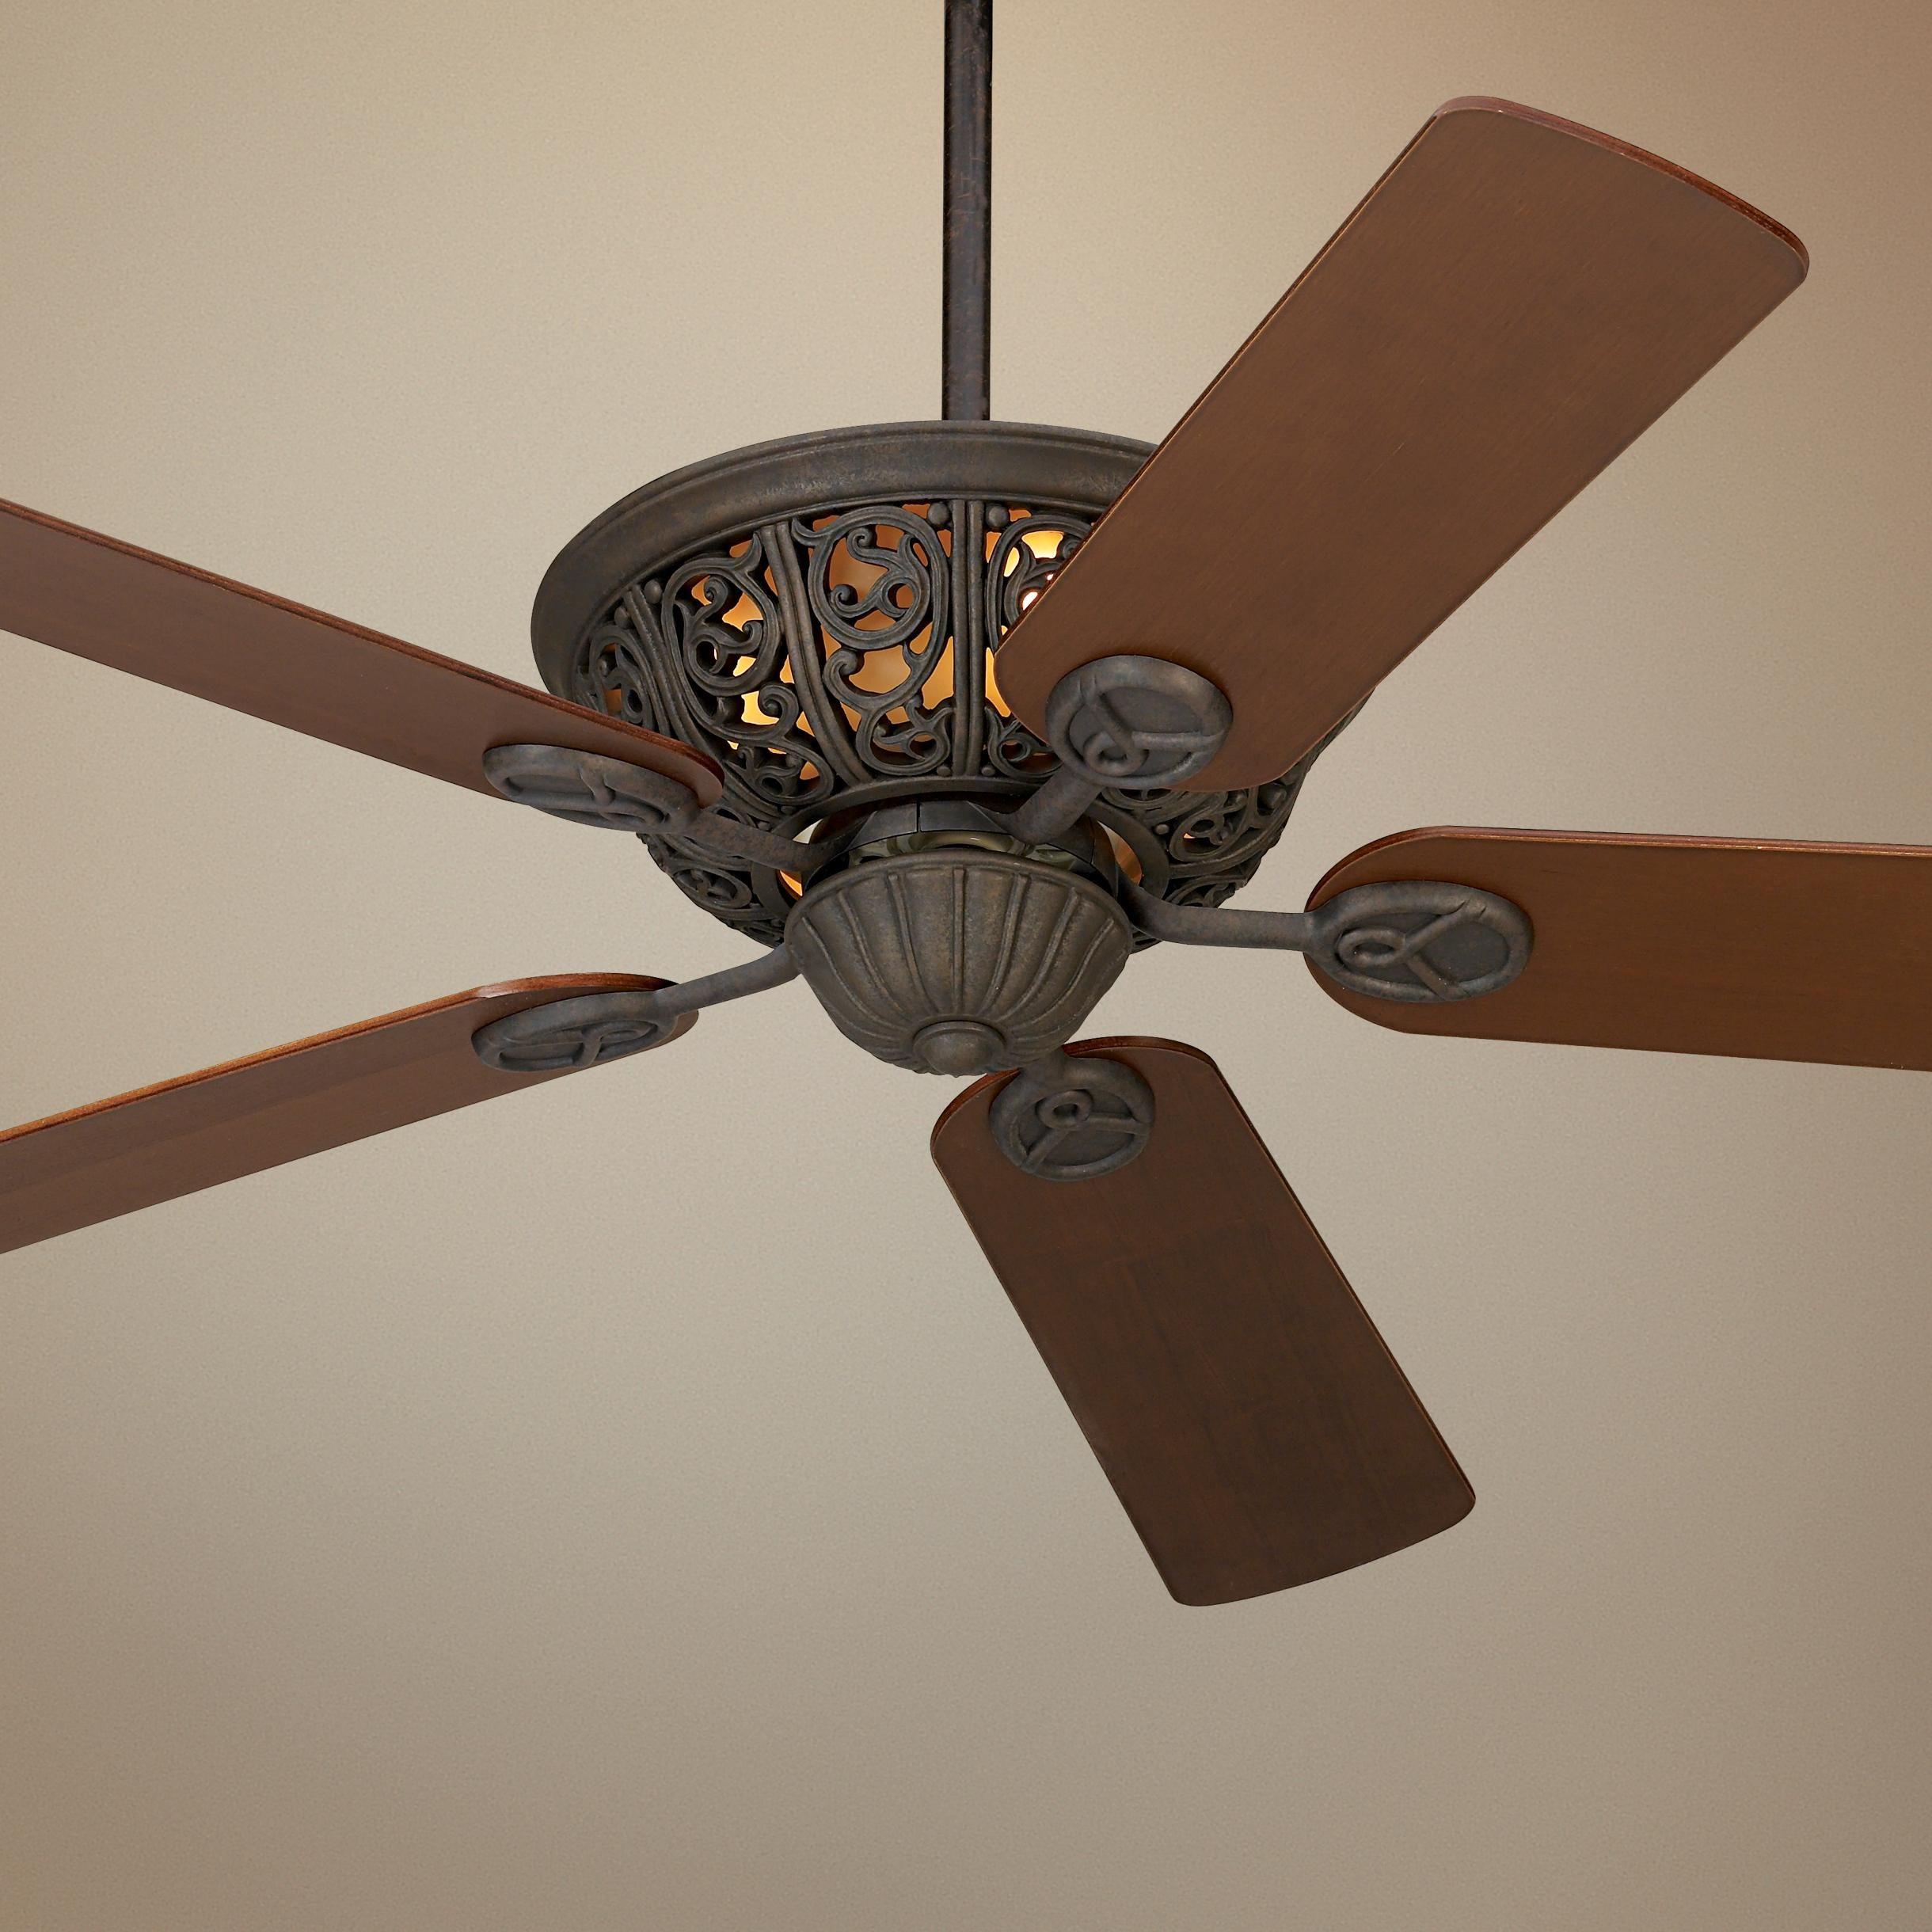 52 Casa Vieja Costa Del Sol Ceiling Fan 61890 Lamps Plus Ceiling Fan Elegant Ceiling Fan Traditional Ceiling Fans